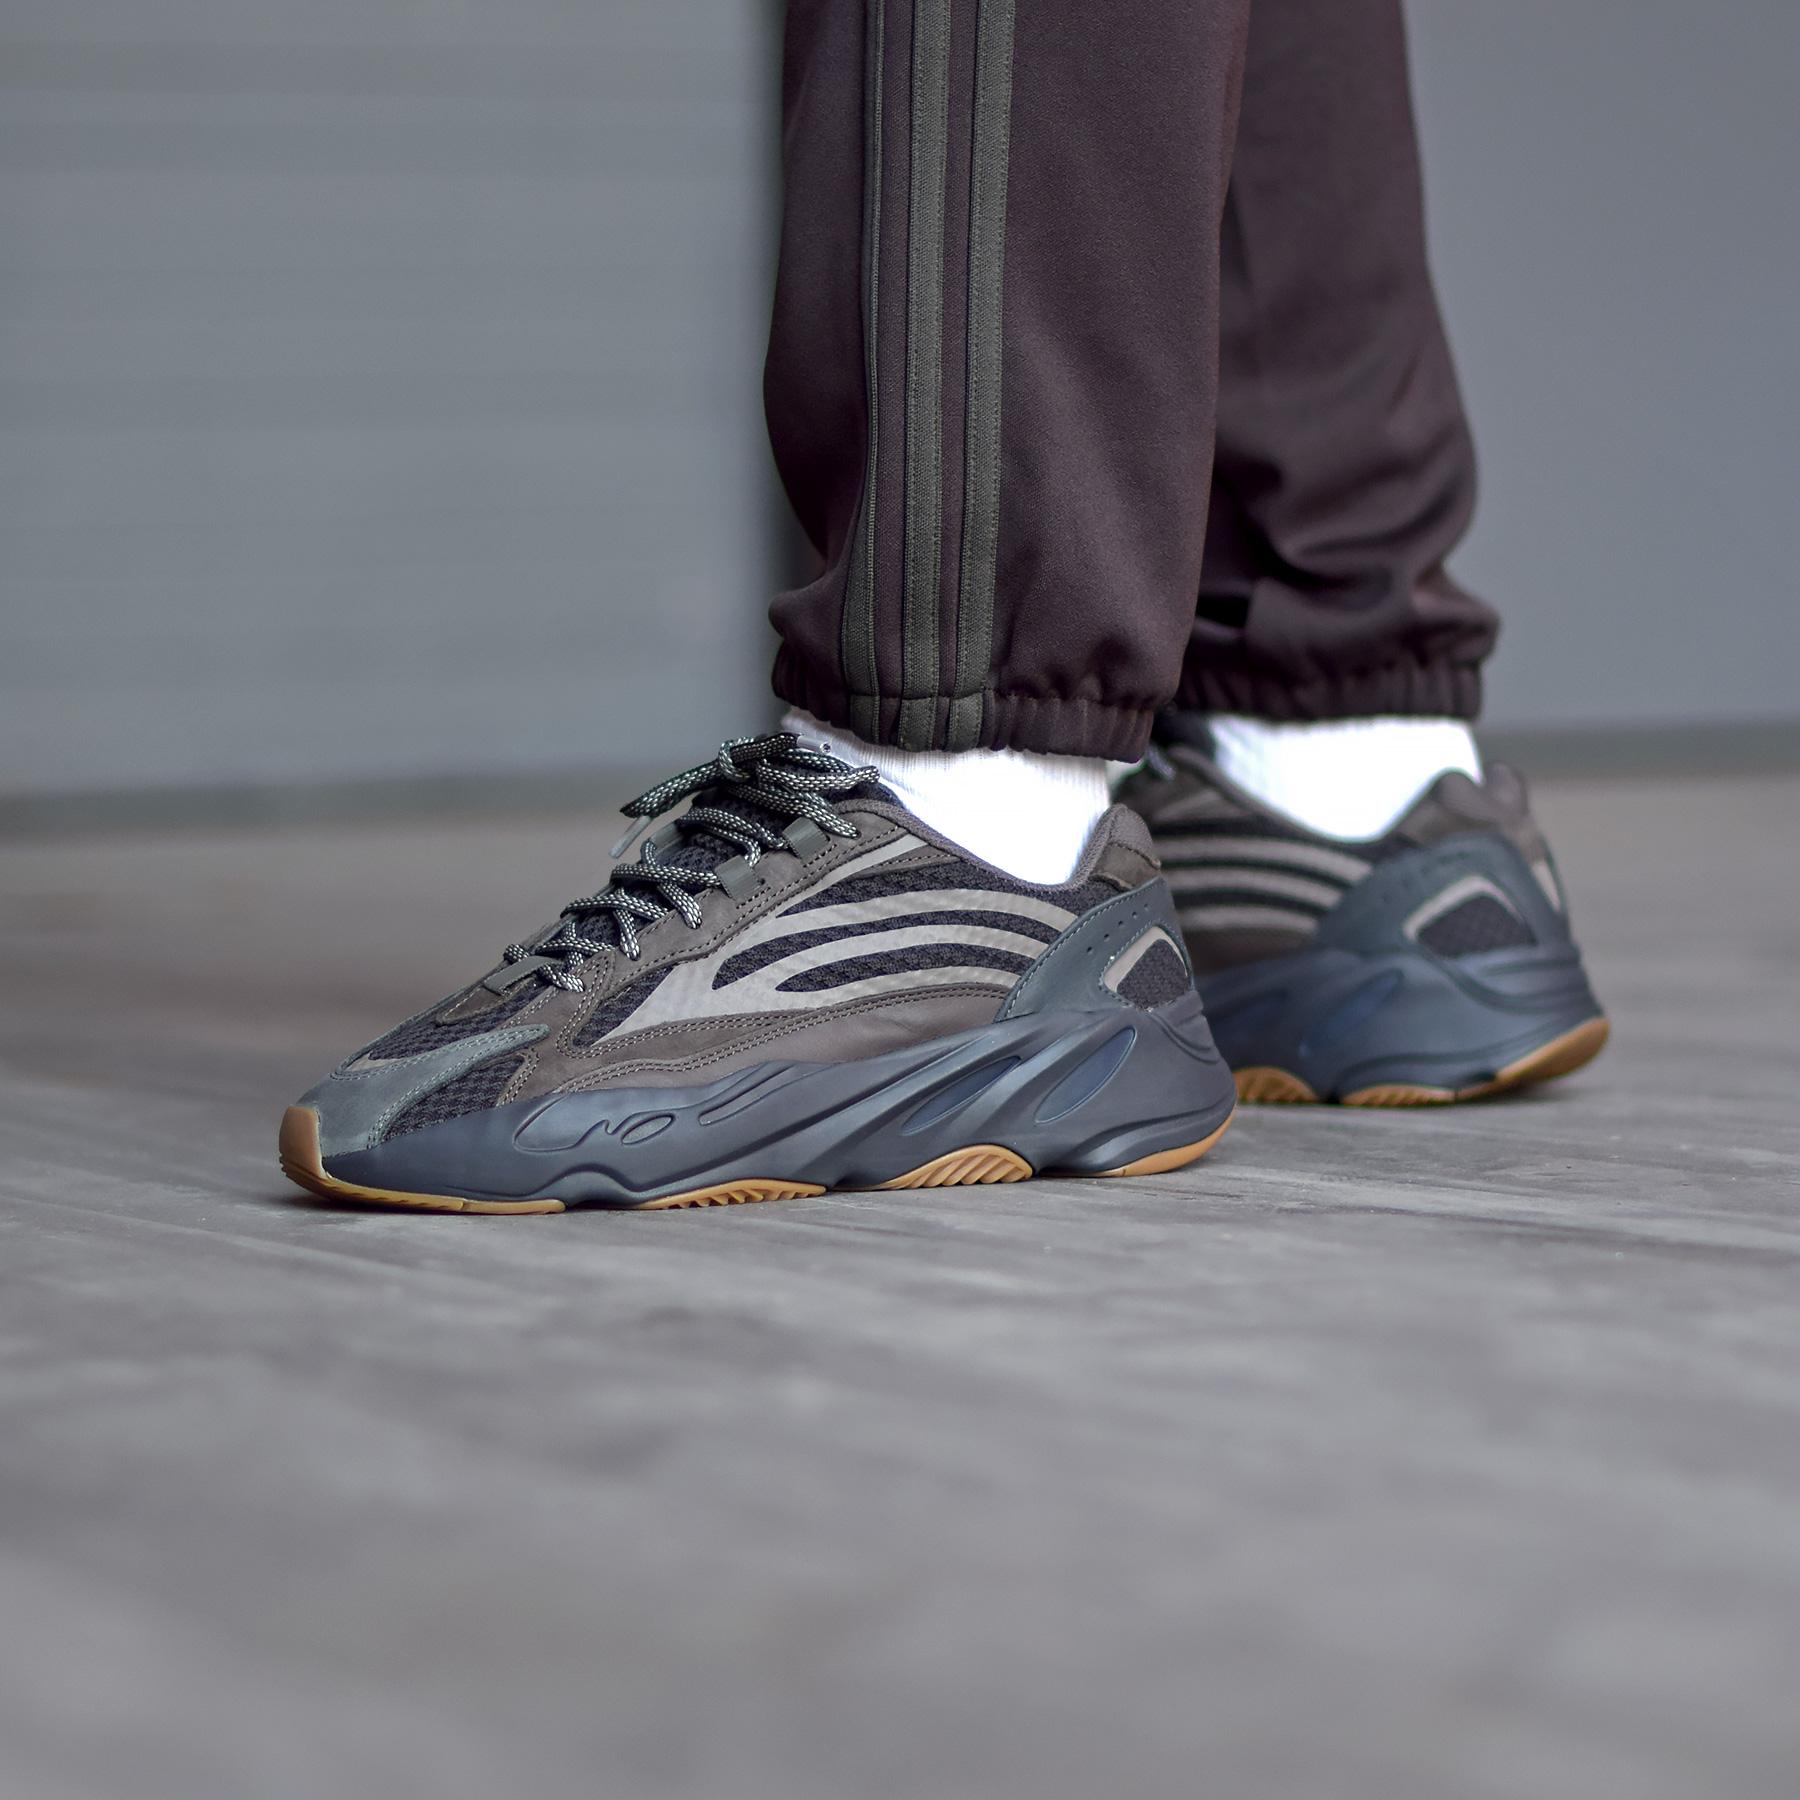 adidas Yeezy Boost 700 v2 « Geode »